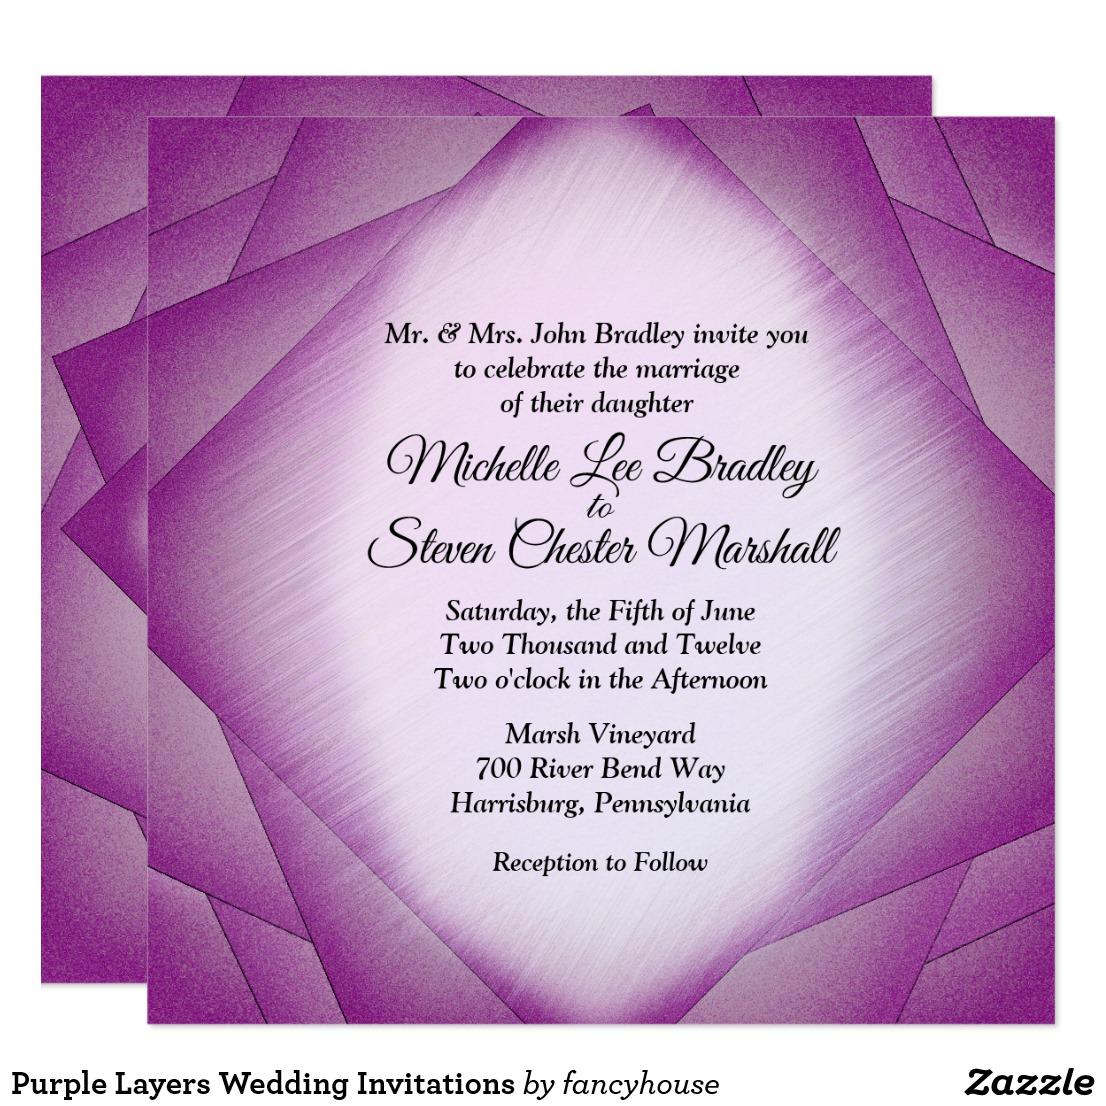 Purple Layers Wedding Invitations